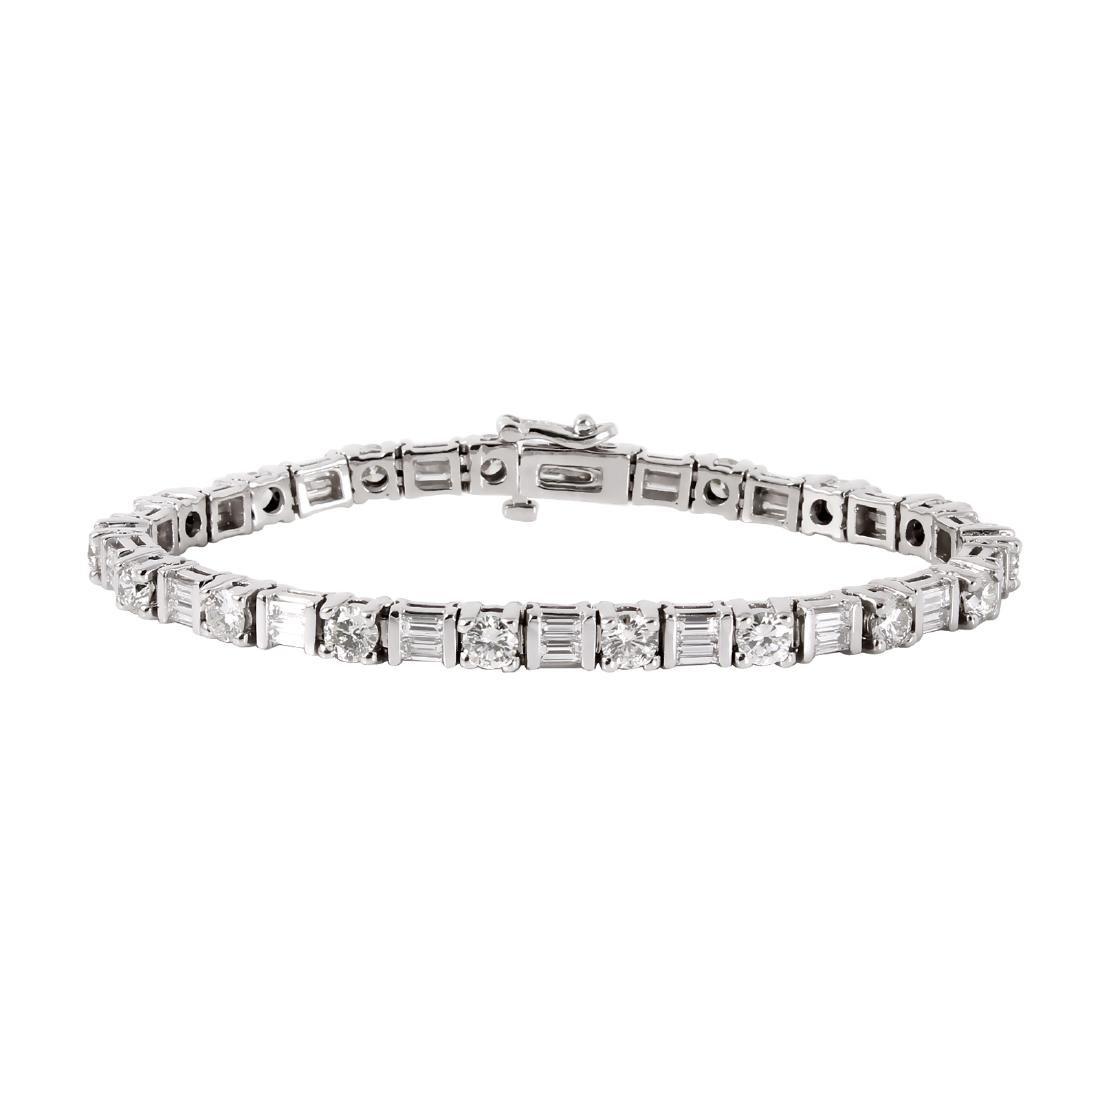 New Platinum Diamond Tennis Bracelet